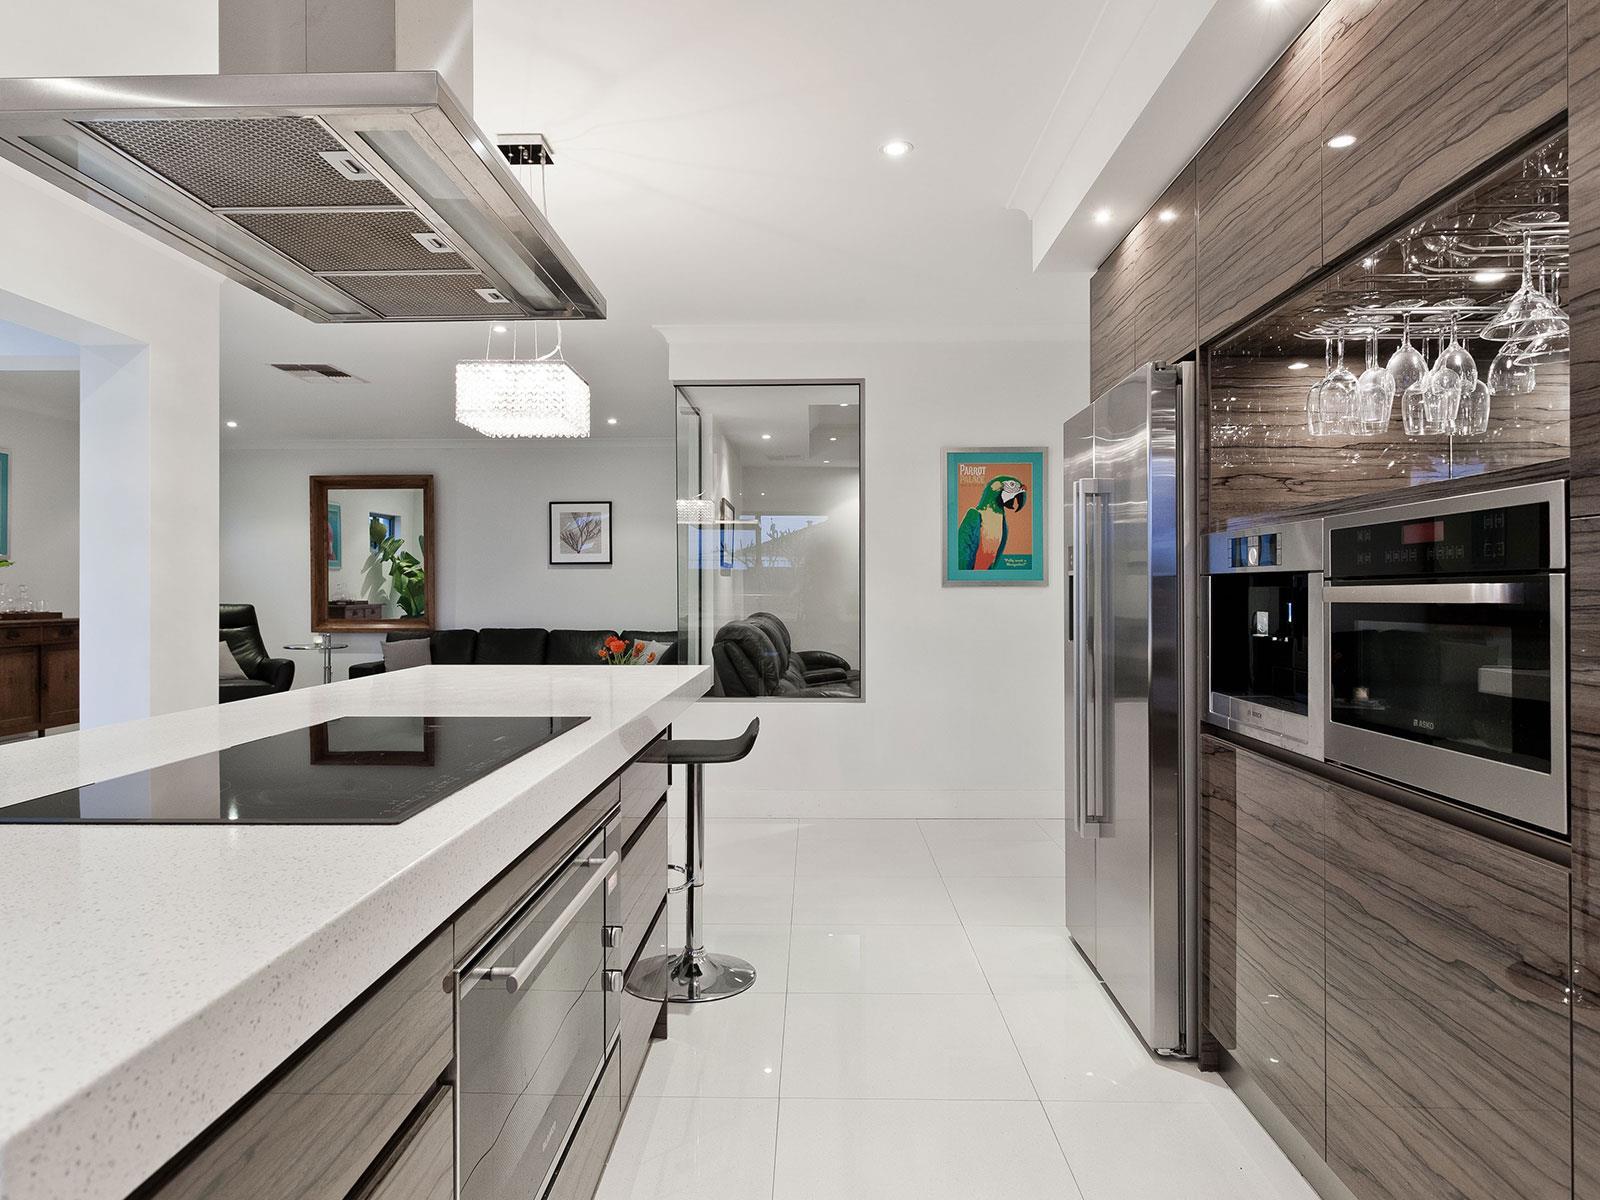 Appartement - Auderghem - #4443202-1